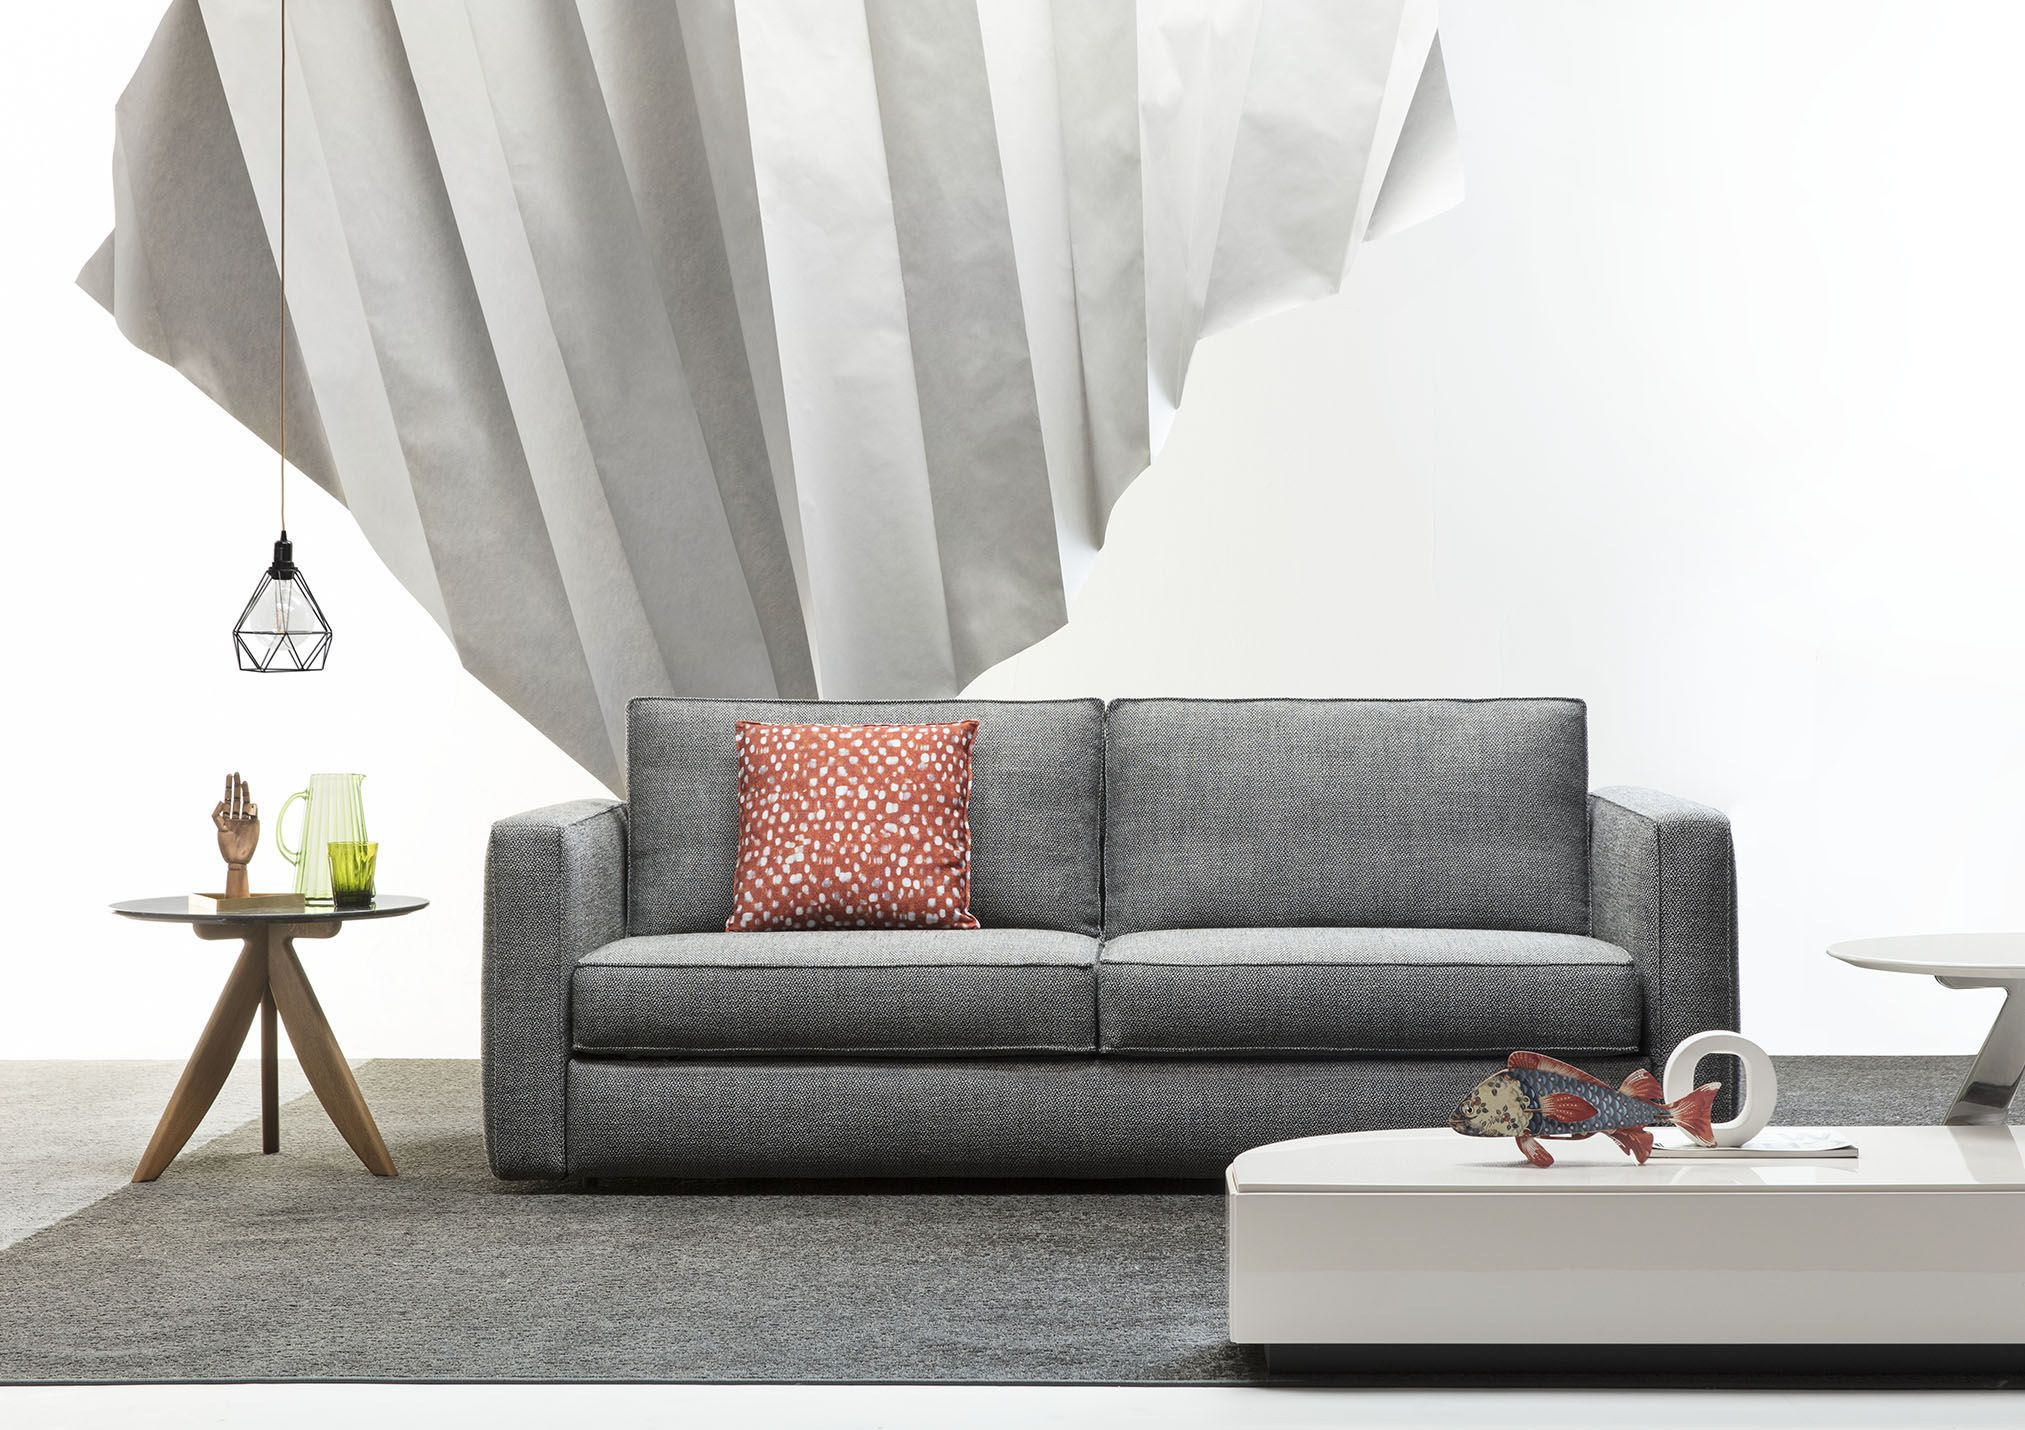 Living Room Gulliver Sofa Bed Made By Berto From Italy With Love Divano Letto Matrimoniale Divani Divano Letto